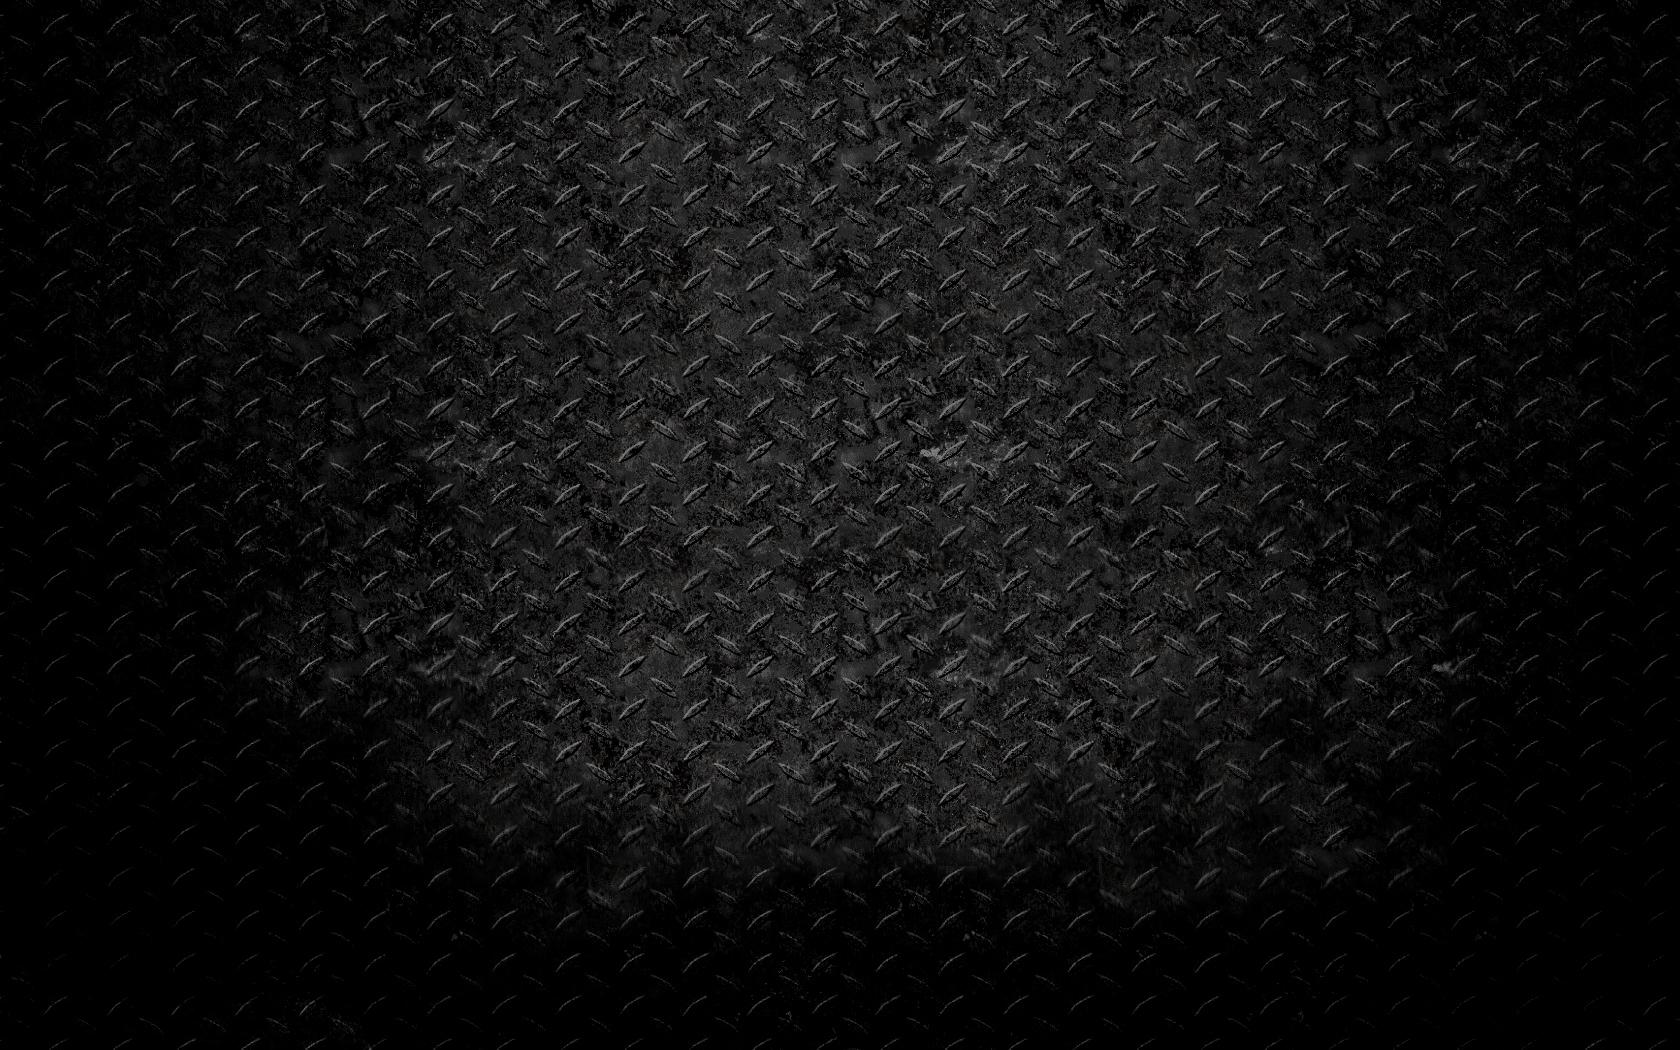 Black Diamonds Diamondplate Windmachines Png Black Diamond Png Black Background And Diamond Plate Gothic Wallpaper Wallpaper